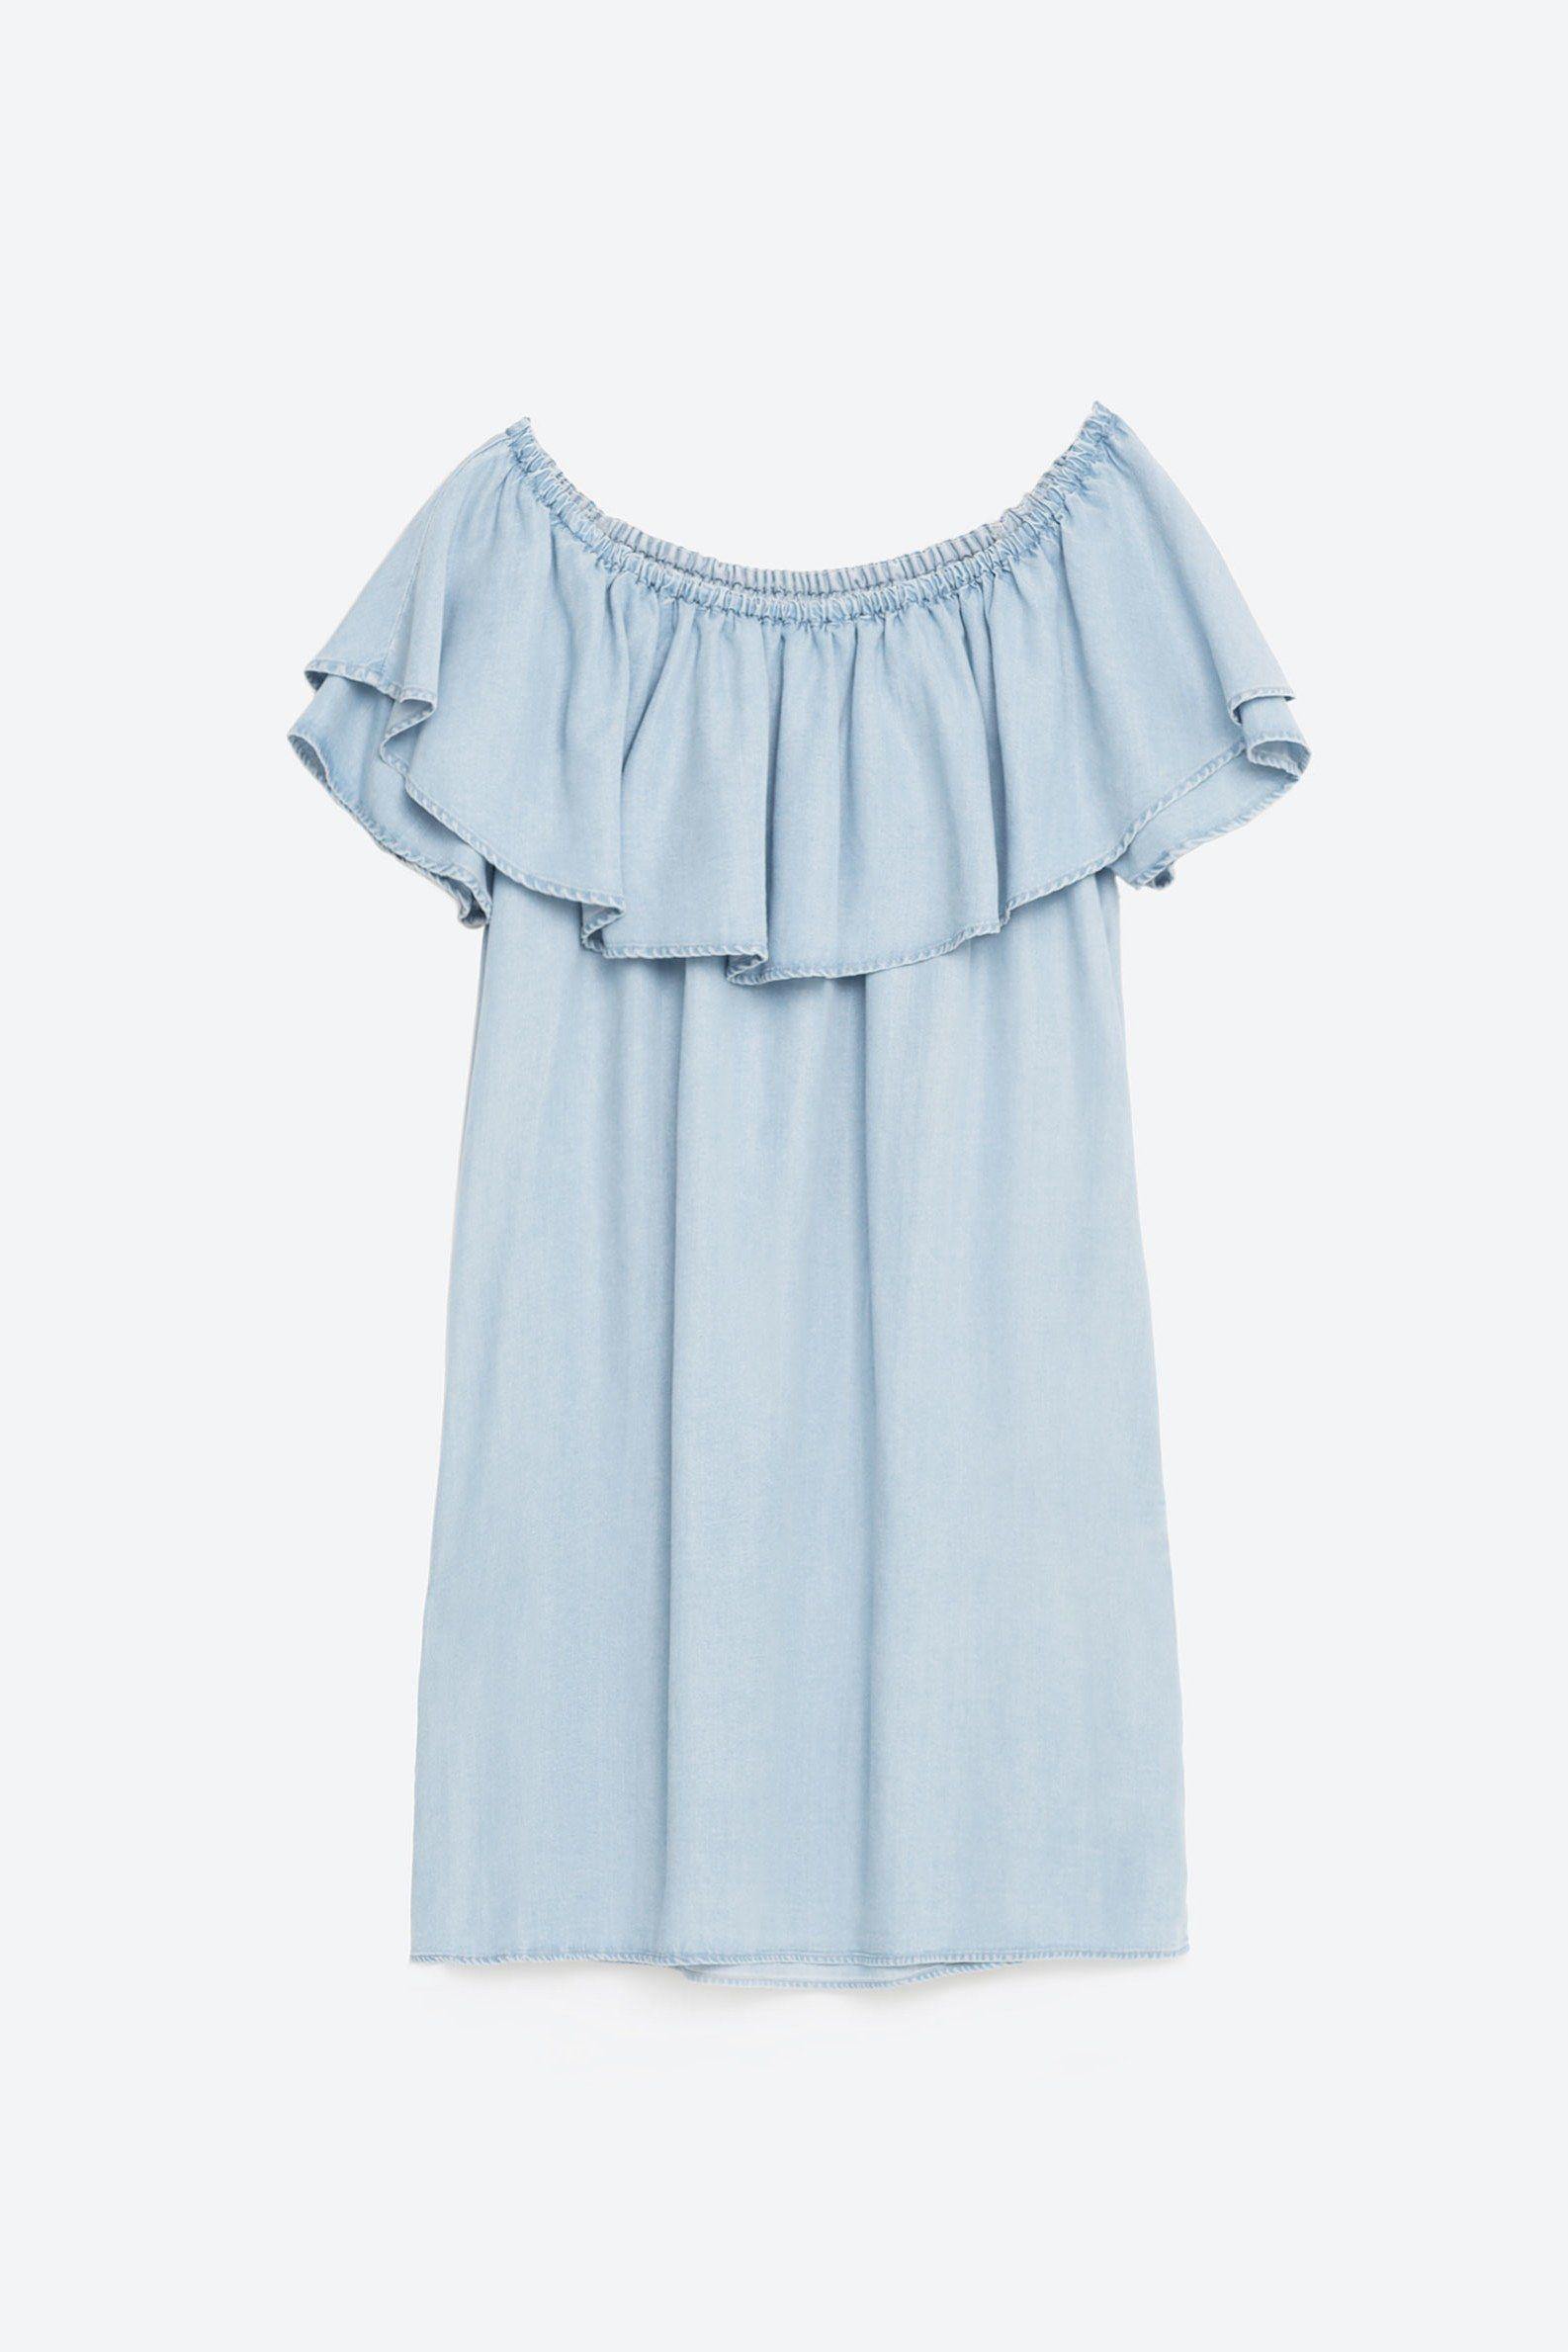 We Want Dakota Fanning S Off The Shoulder Zara Dress Denim Ruffle Dress Ladies Mini Dresses Womens Dresses [ 2379 x 1586 Pixel ]